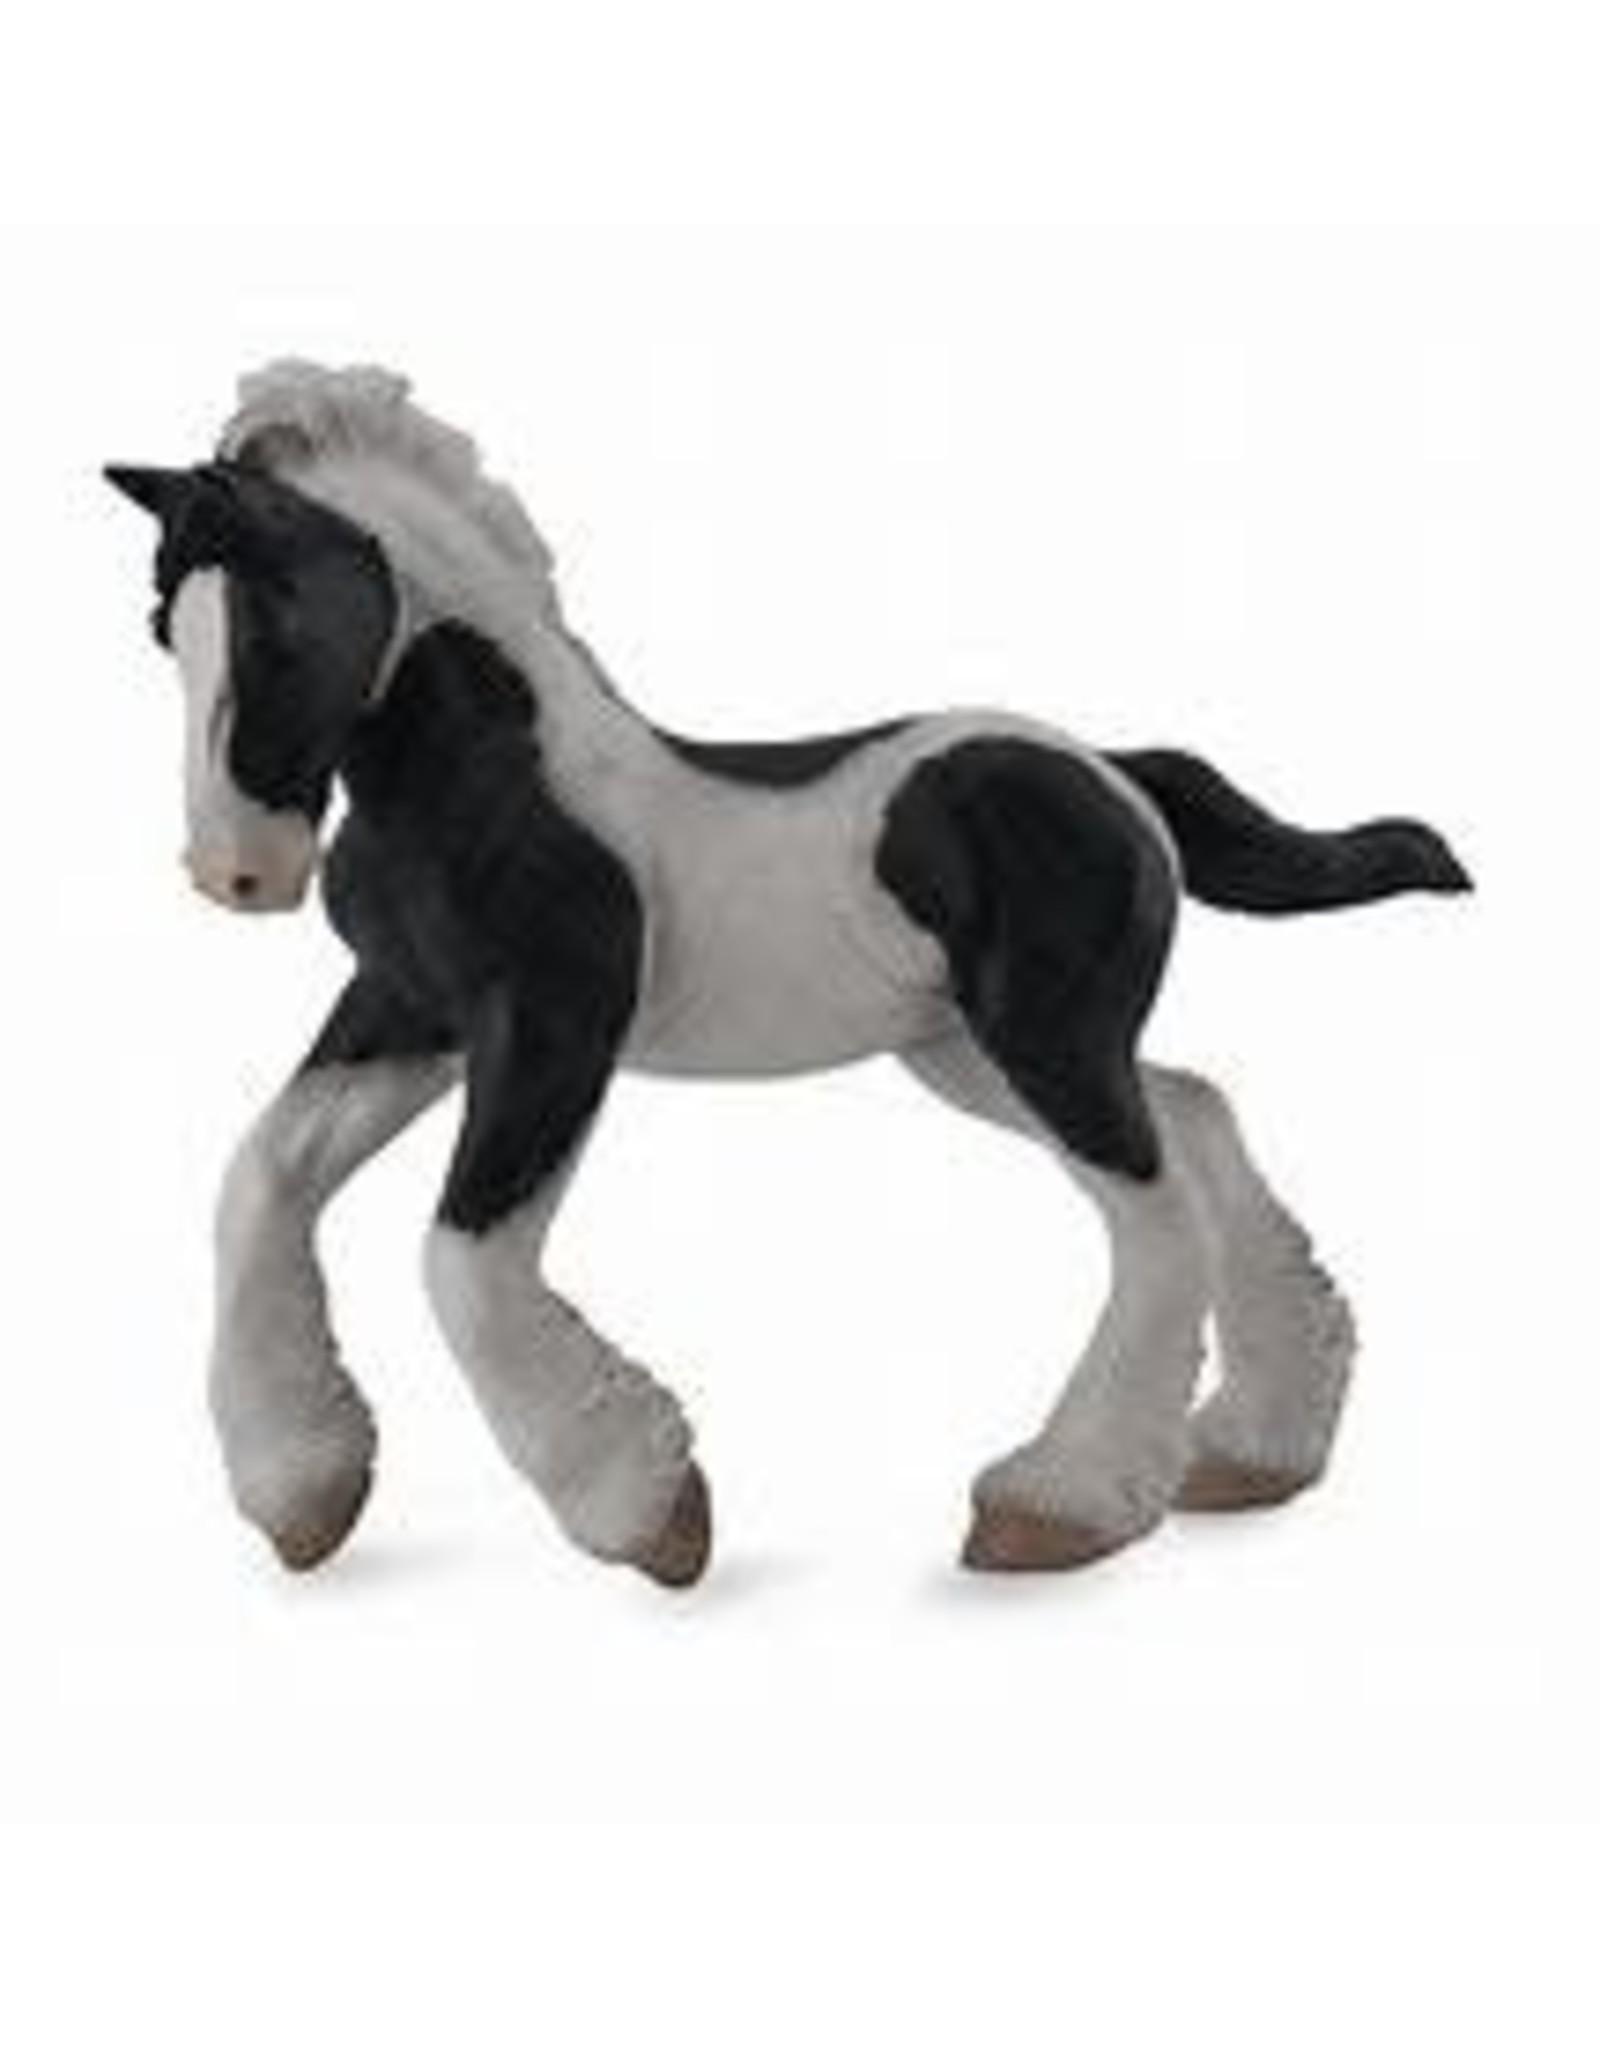 CollectA Black & White Piebald Gypsy Foal